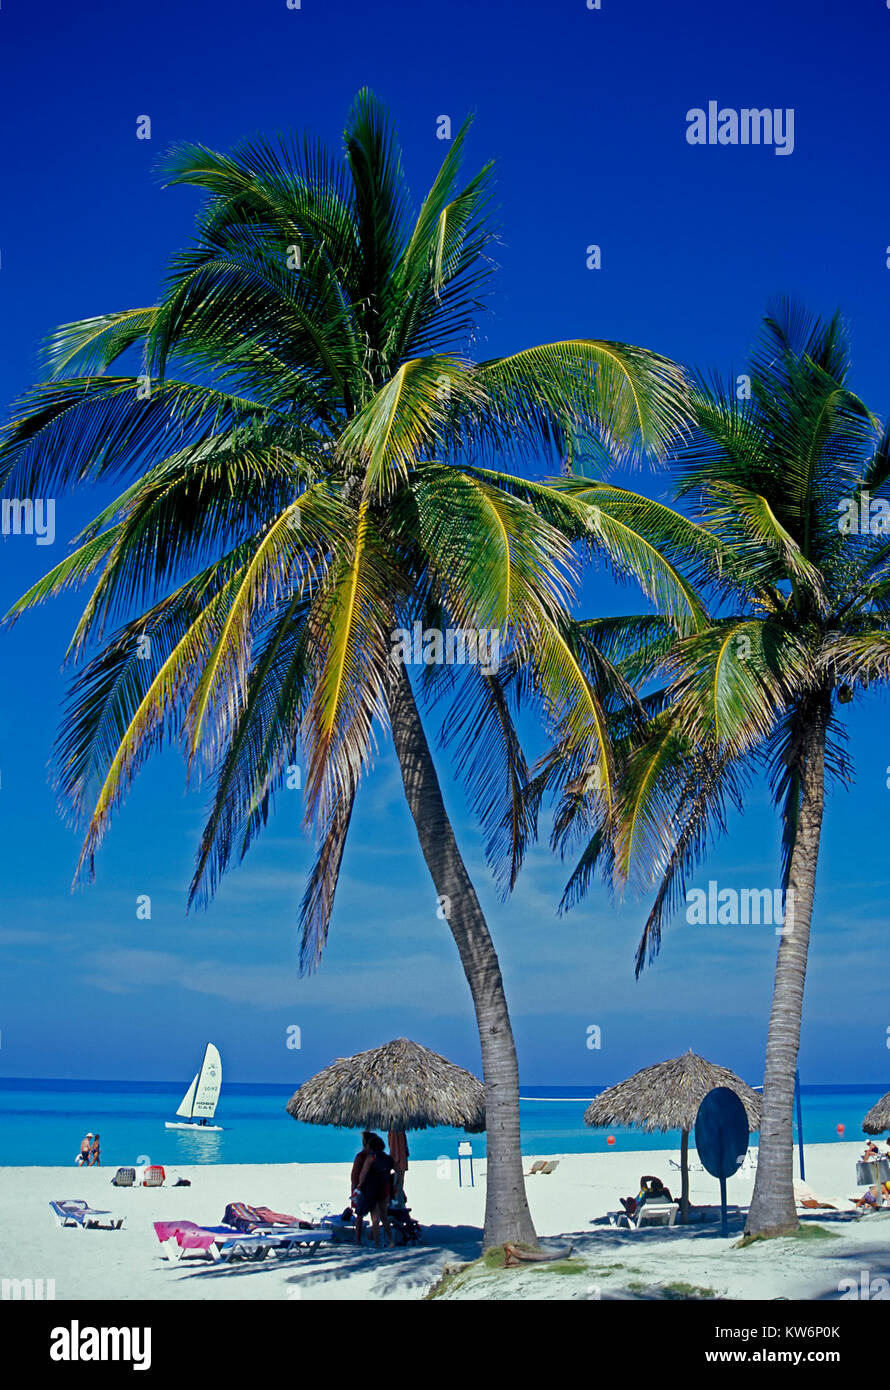 Palmen von Cayo Coco Beach, Kuba Stockbild